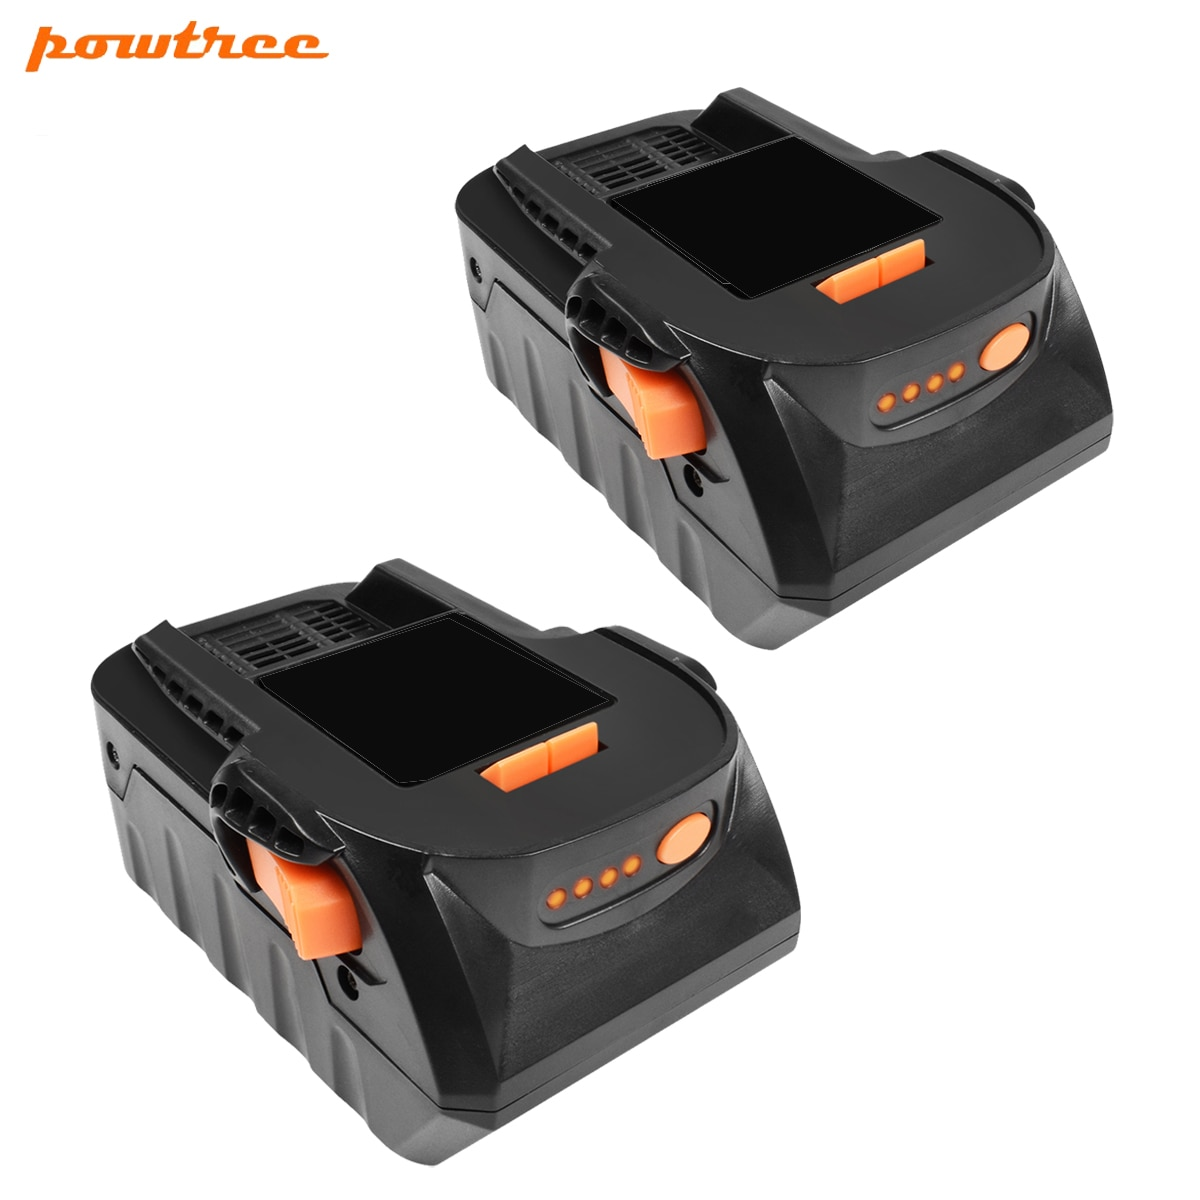 Bonacell 6000mAh 18V Li-Ion herramienta eléctrica recargable de la batería para RIDGID R840083 R840085 R840086 R840087 serie Series AEG L10